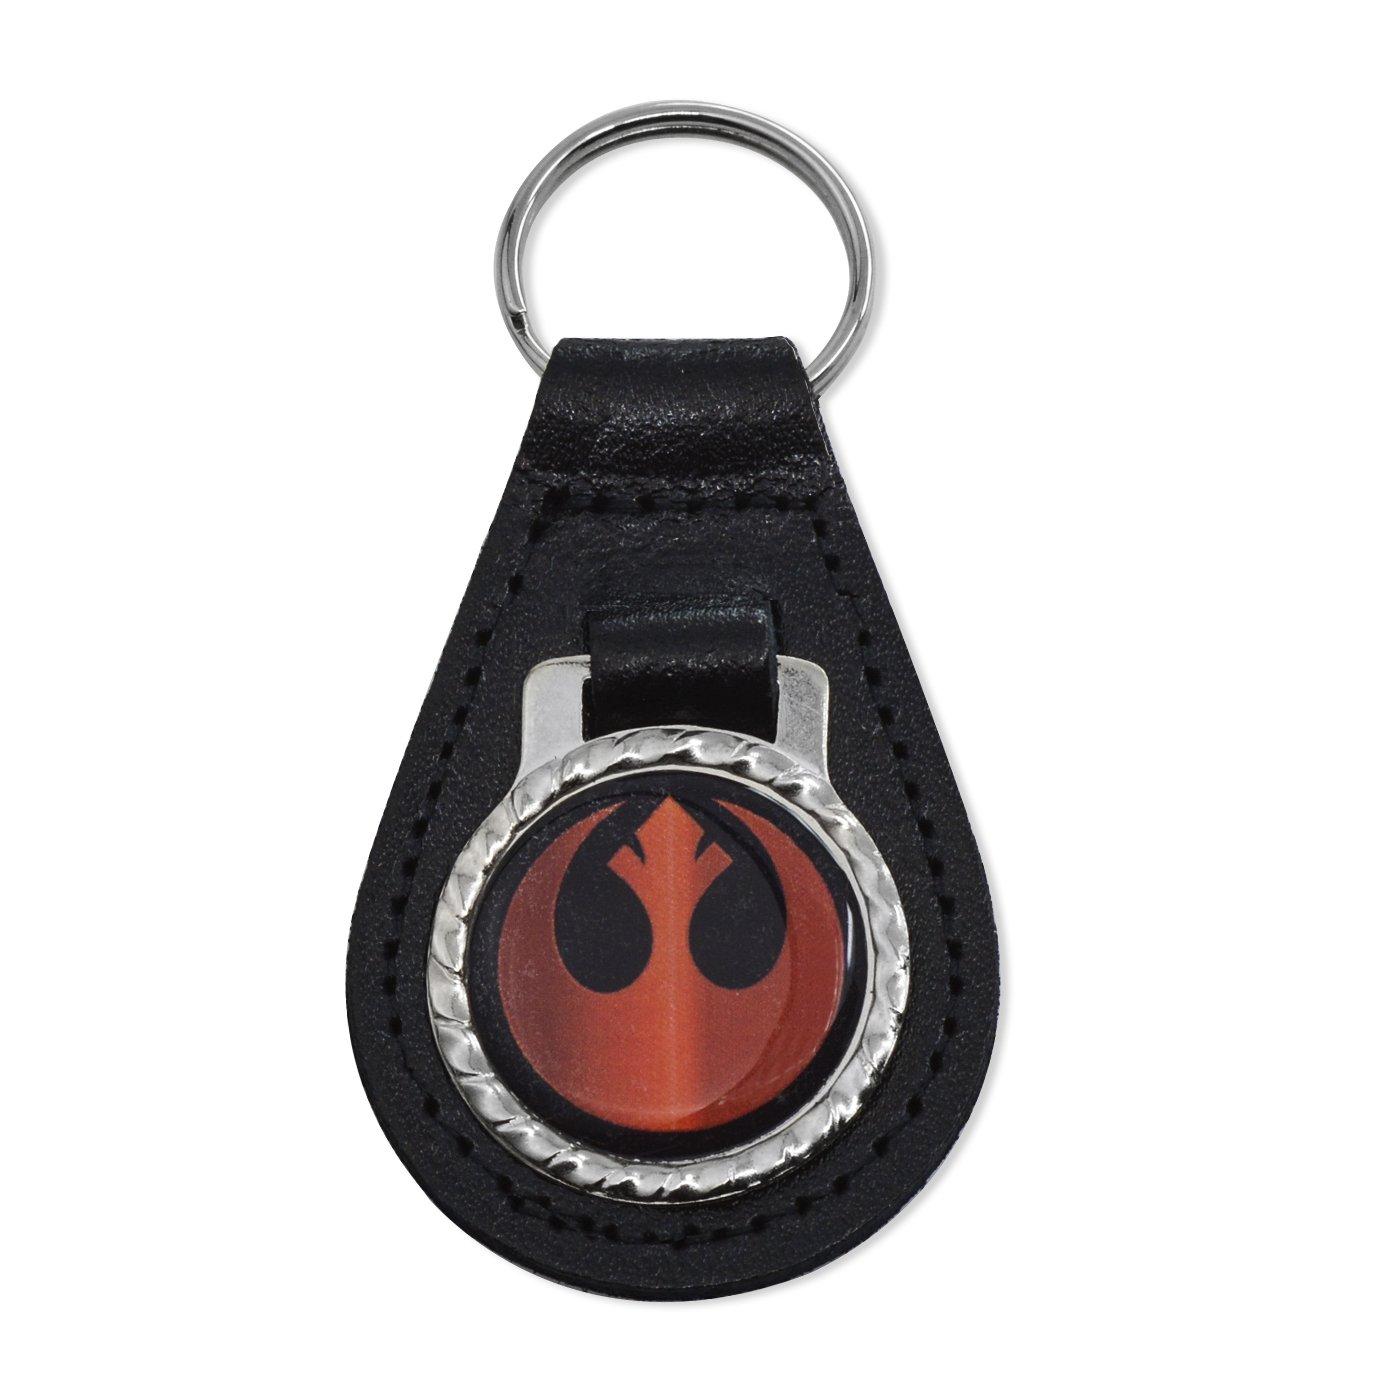 3 Tall EF-ACC-K-00009 EvolveFISH Rebel Alliance Black Leather Keychain Fob